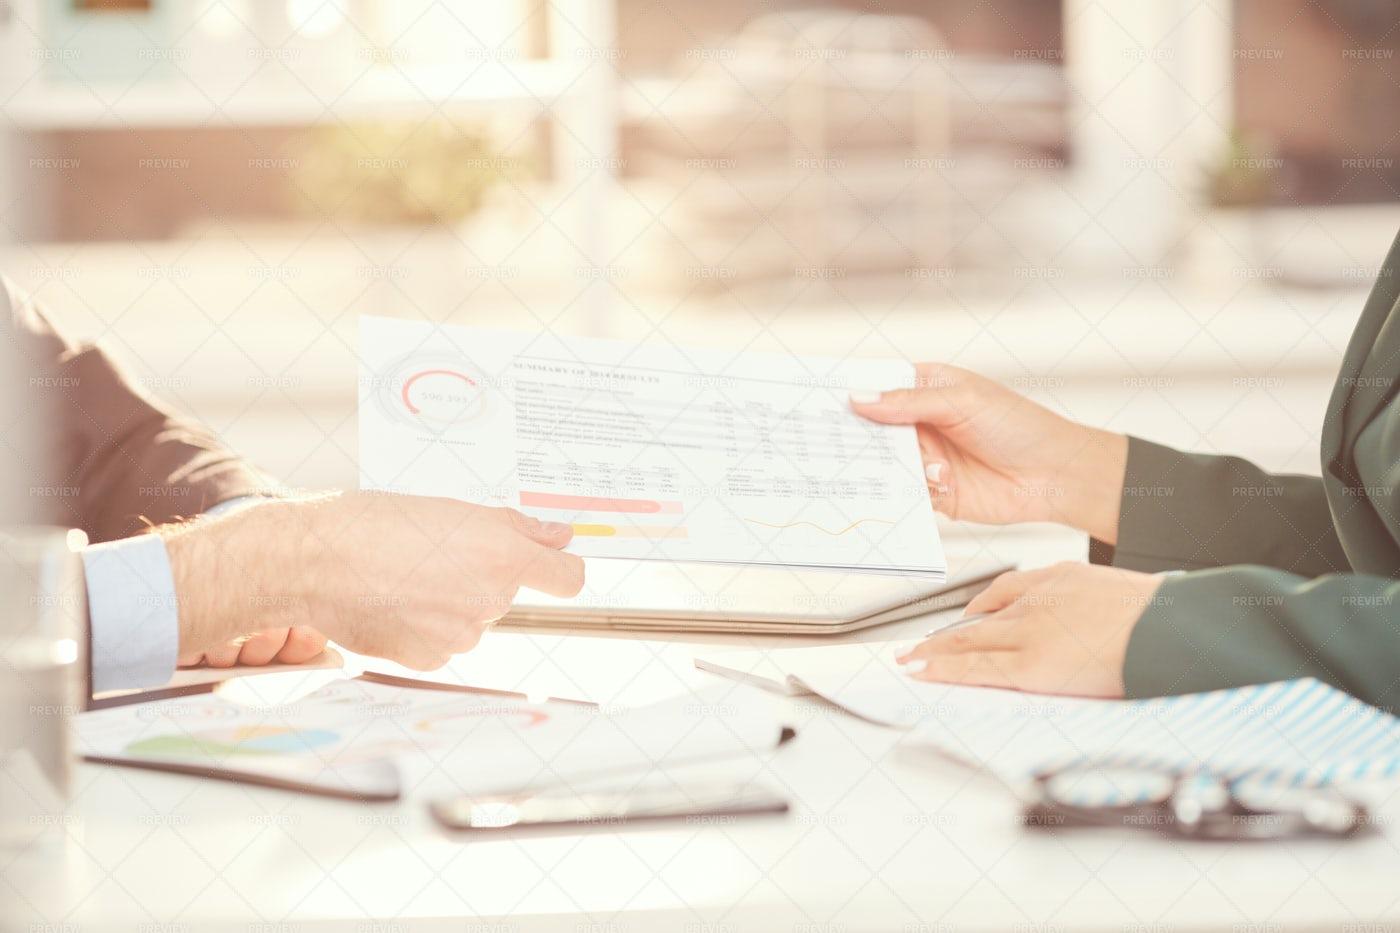 Business People Handing Documents...: Stock Photos